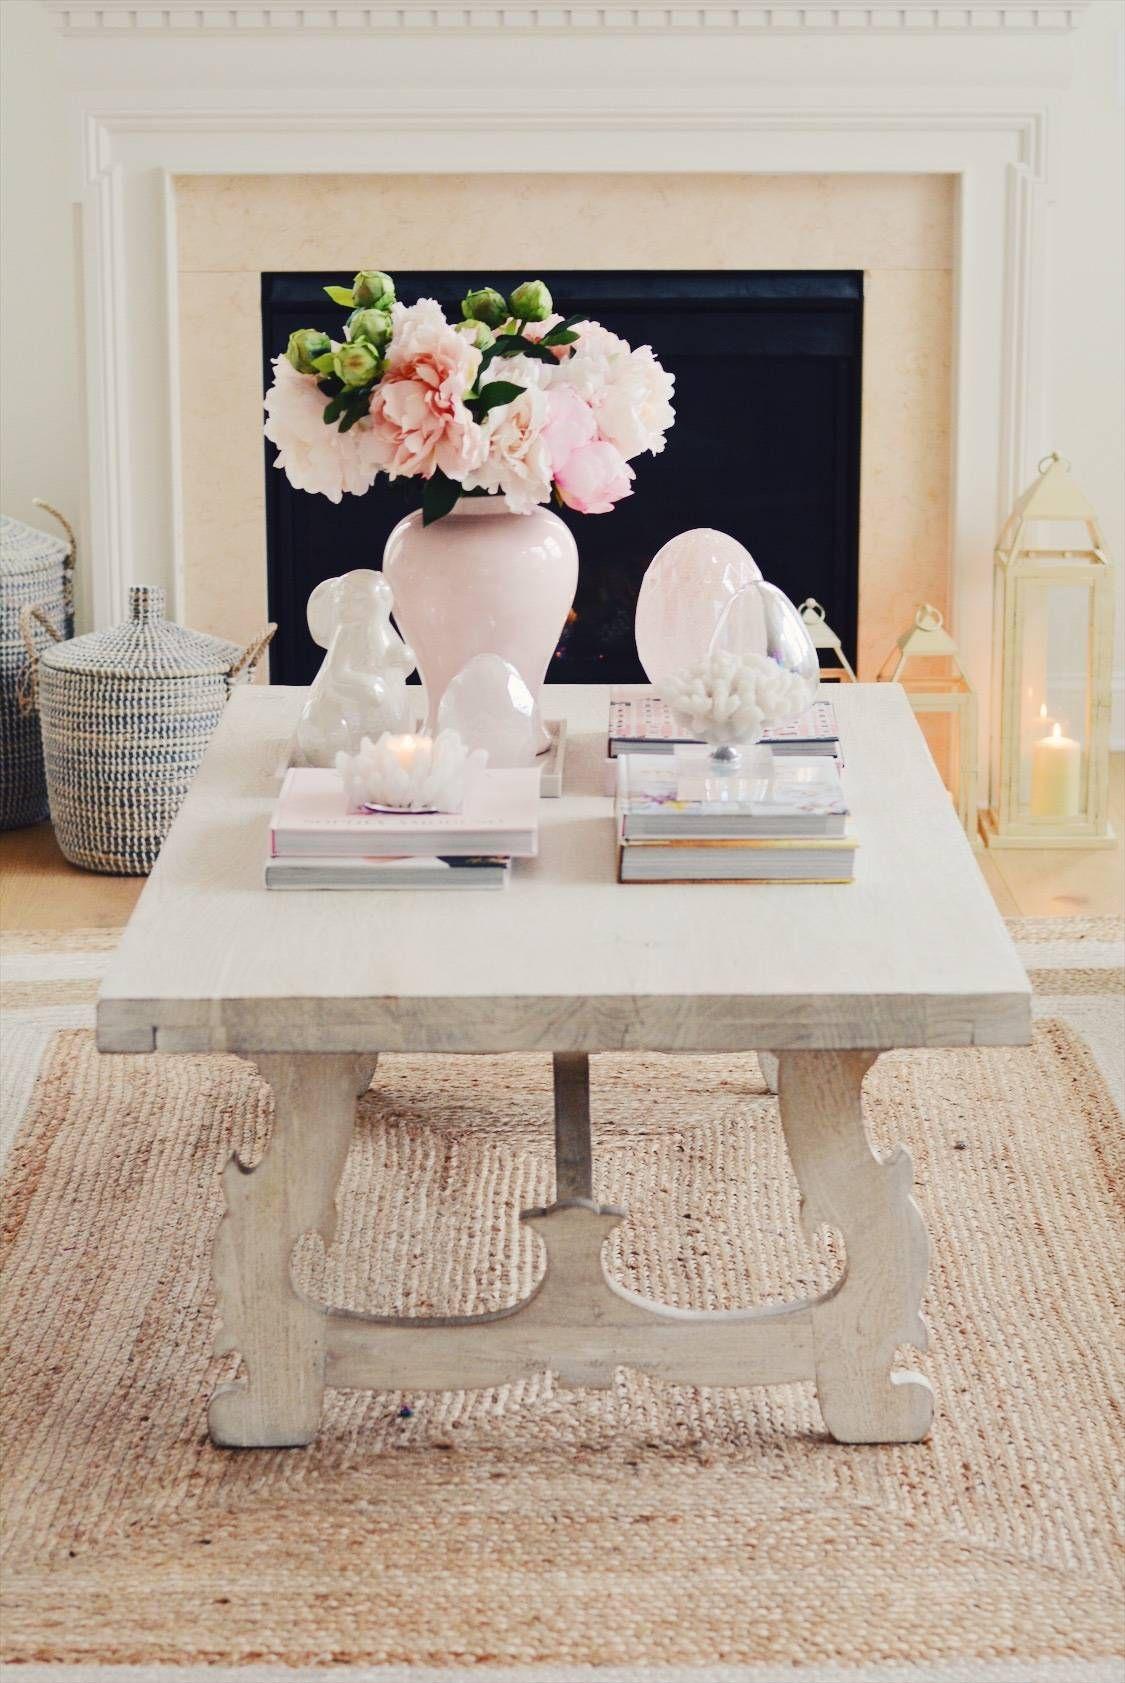 Elegant Spring Home Tour And Easter Decor 2019 Decor Easter Coffee Table Decor Coffee Table Books Decor